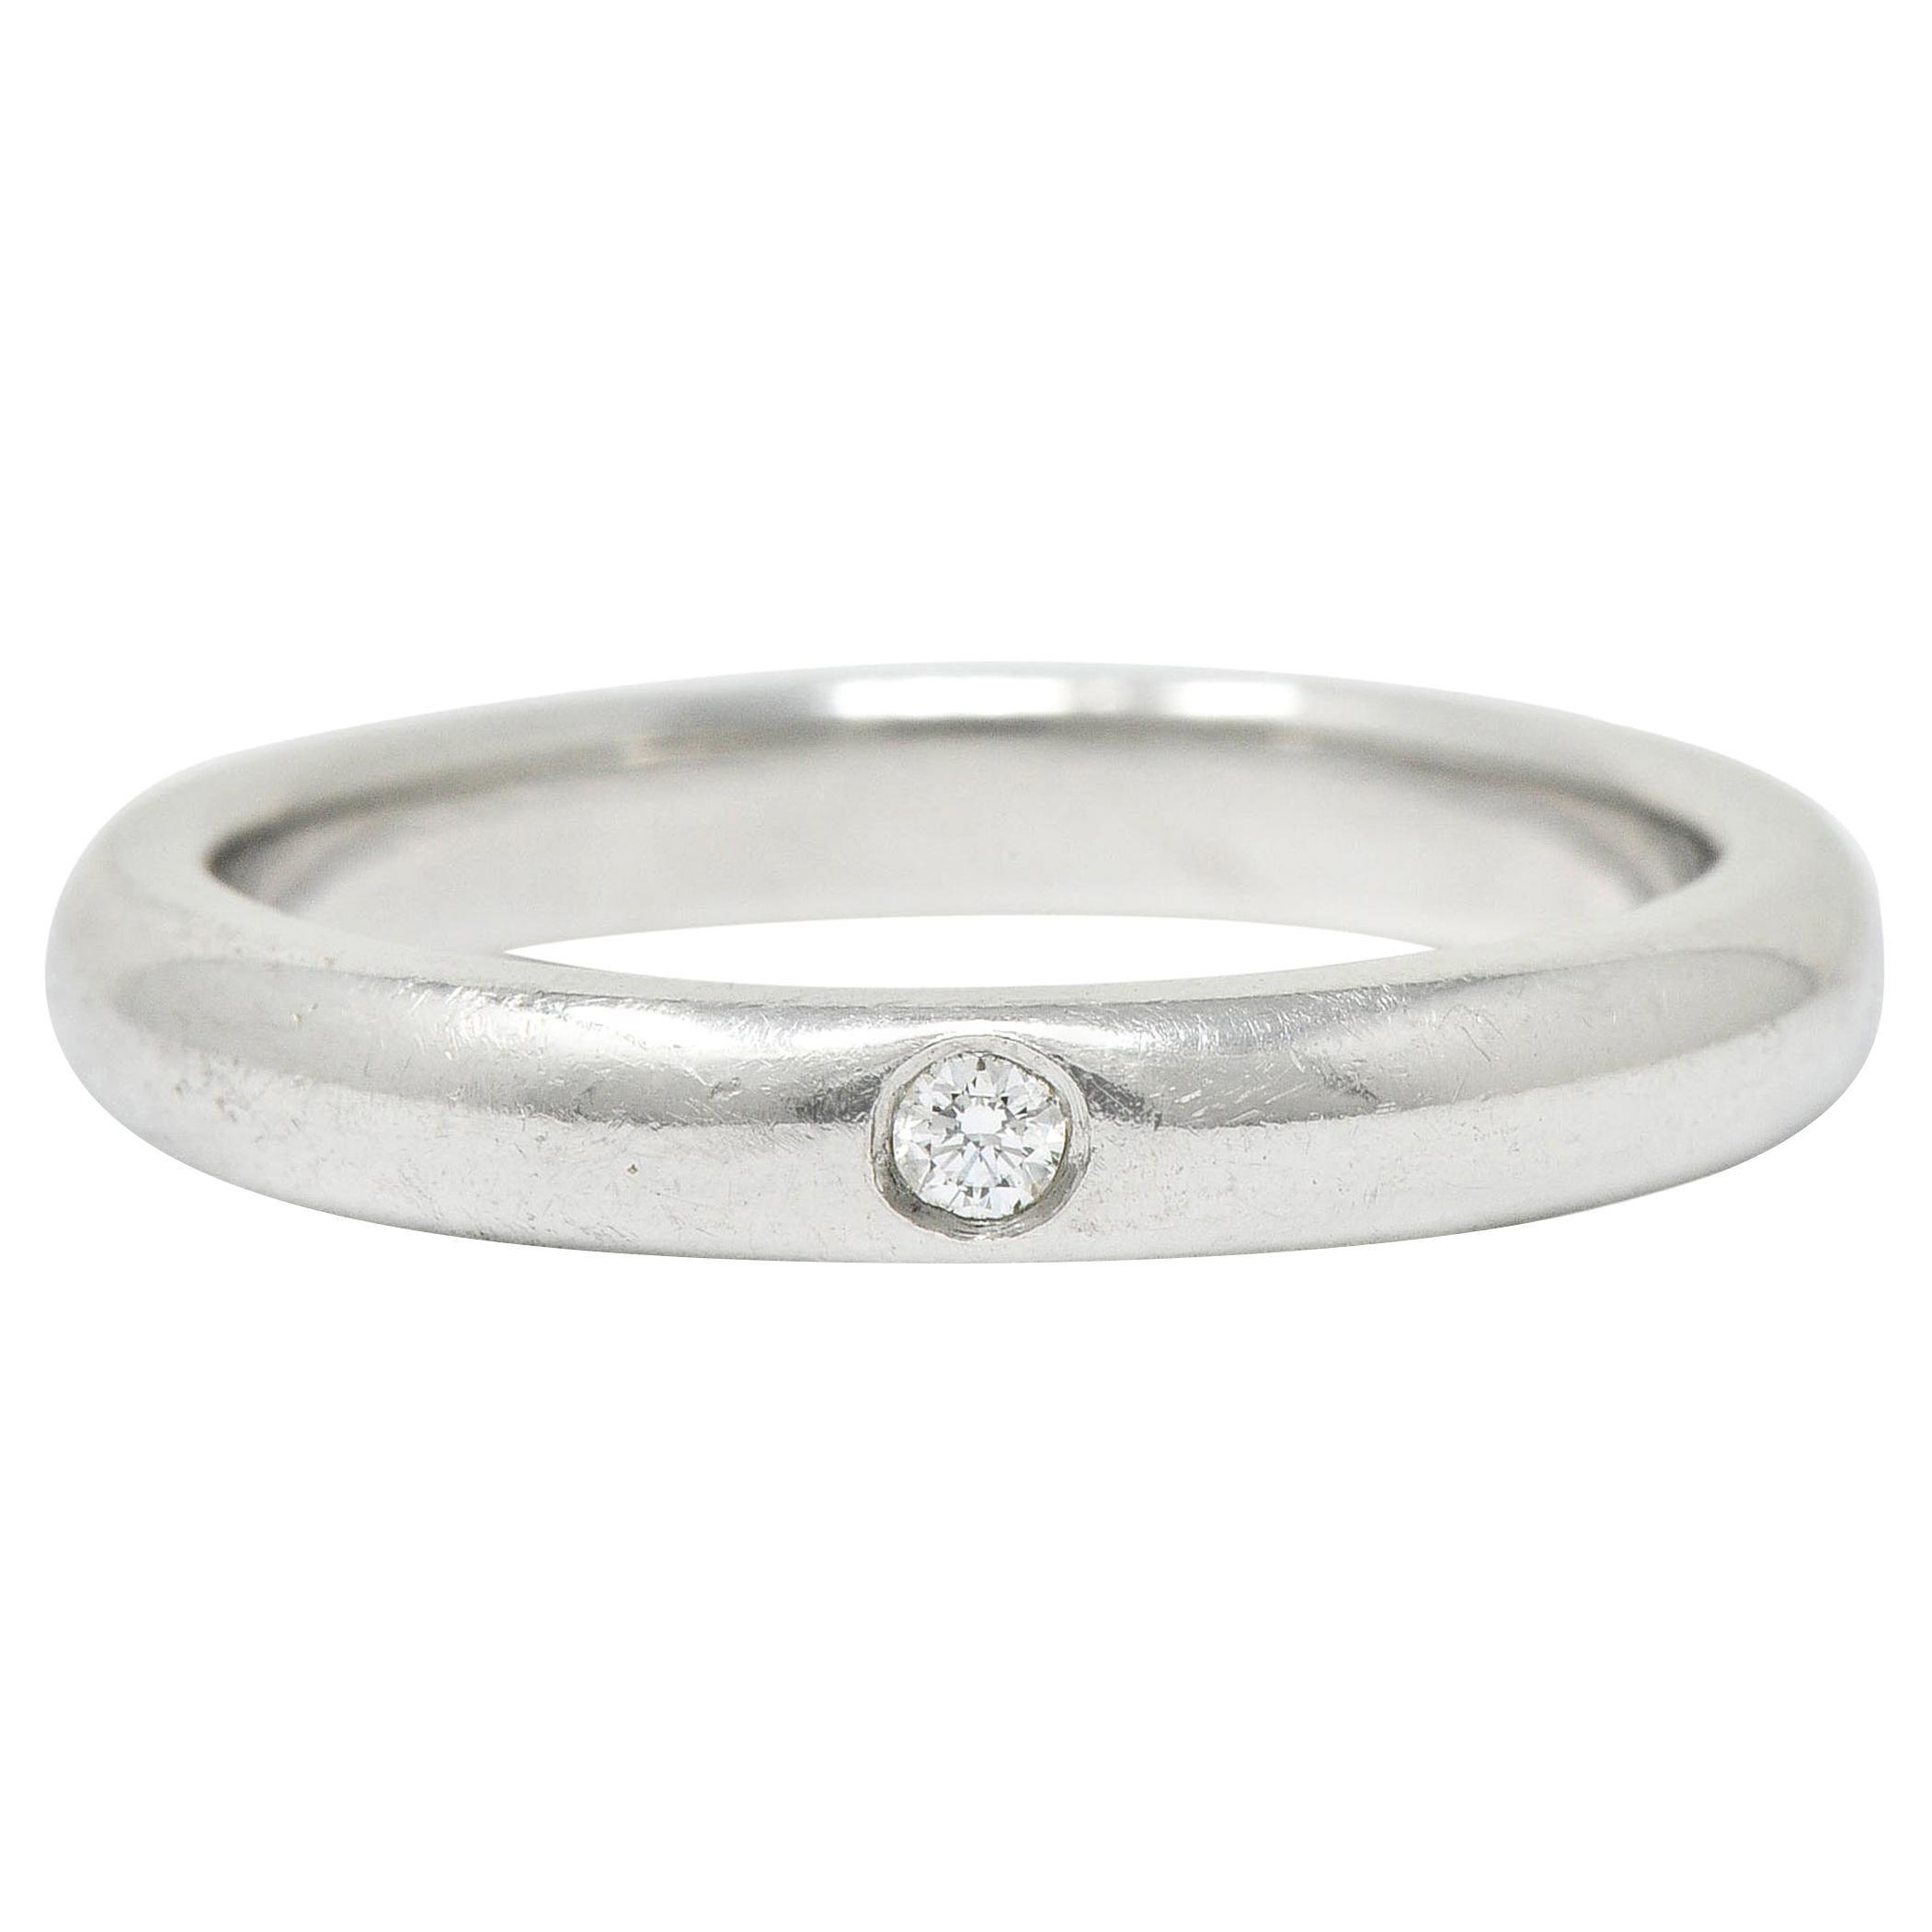 Elsa Peretti Tiffany & Co. Inset Diamond Platinum Band Ring